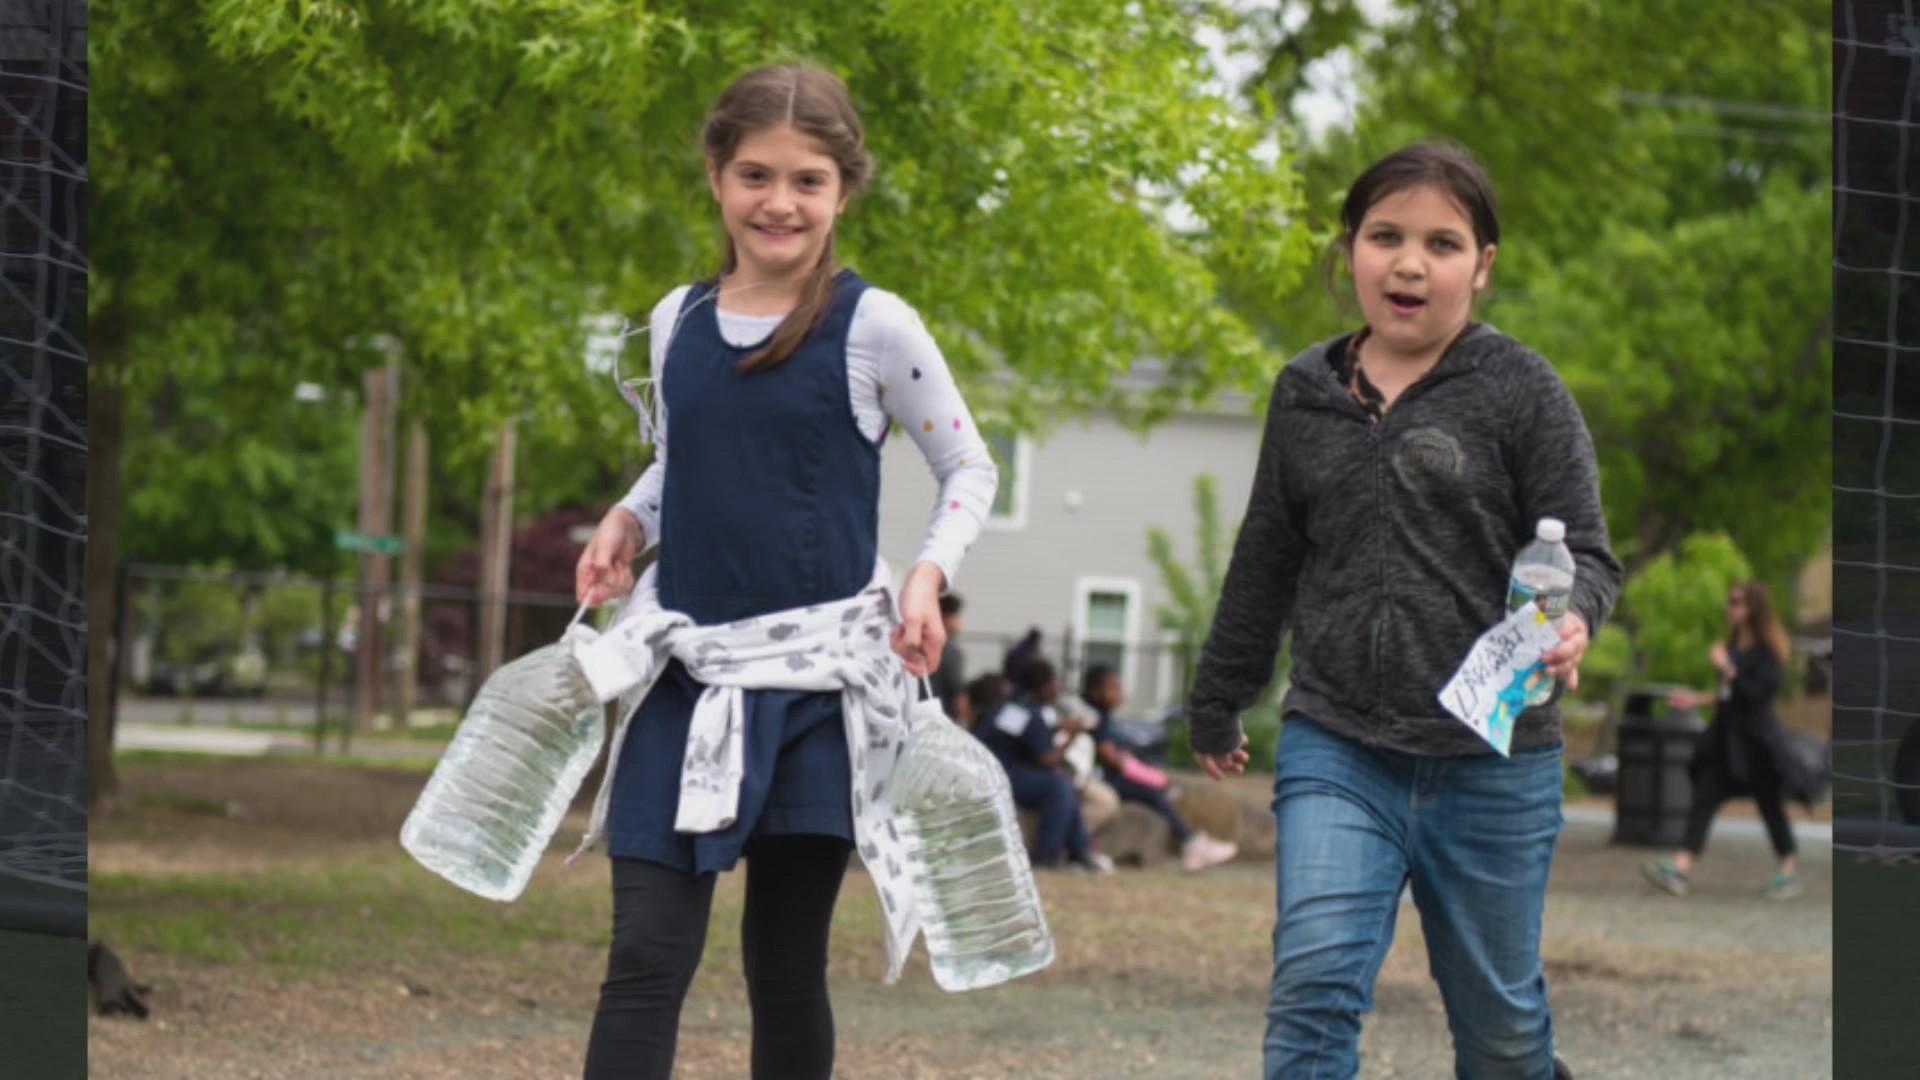 Elementary_School_raises_money_for_South_0_20190506213317